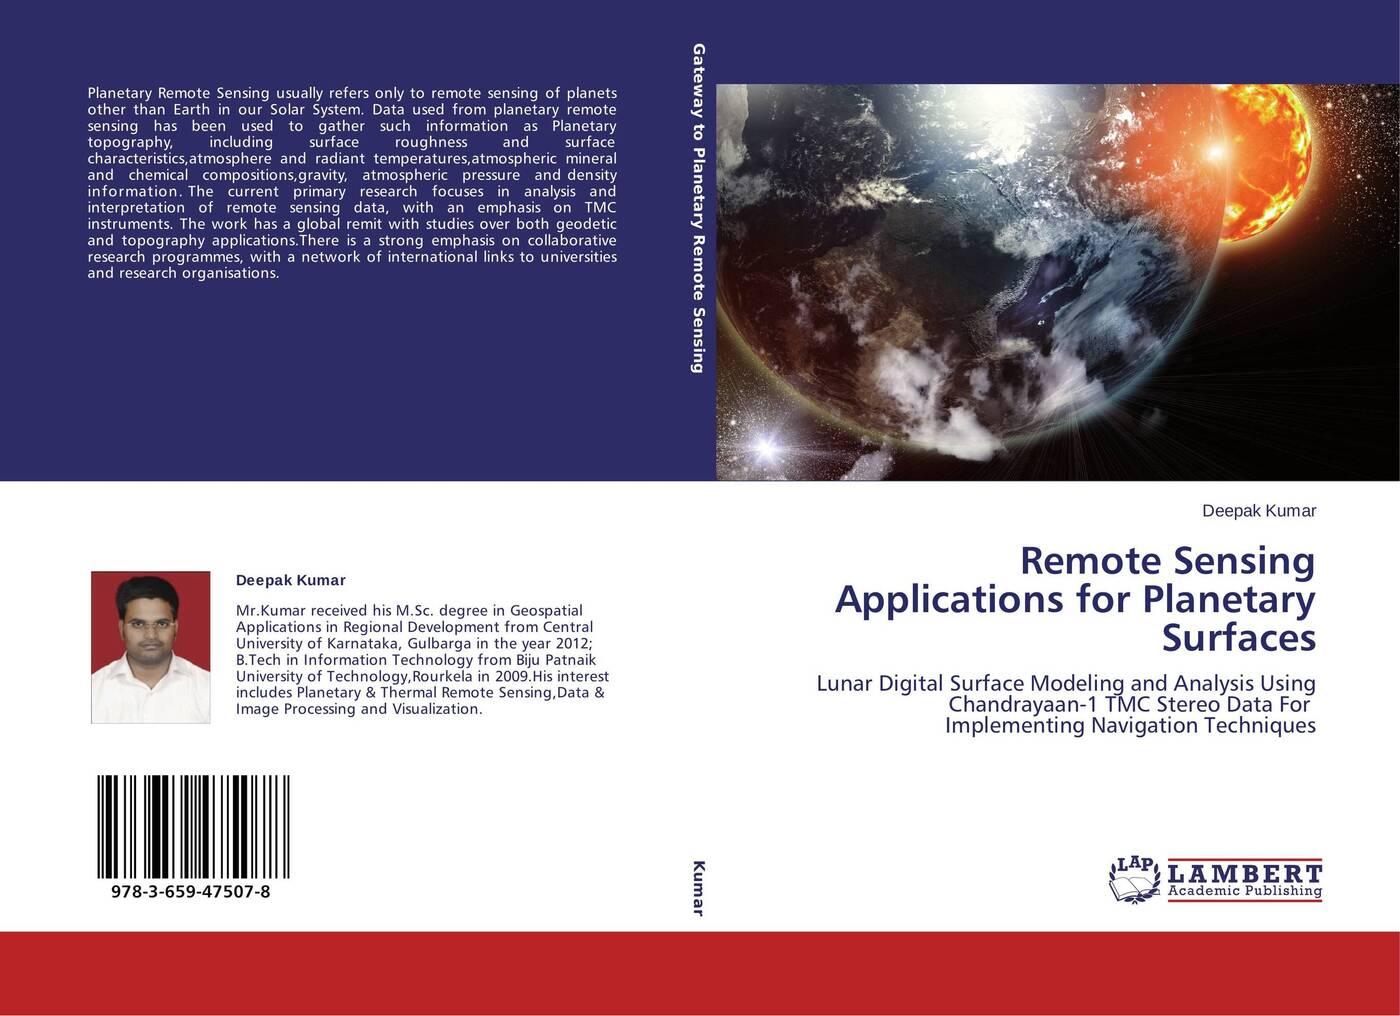 Deepak Kumar Remote Sensing Applications for Planetary Surfaces klemas victor v remote sensing and global environmental change